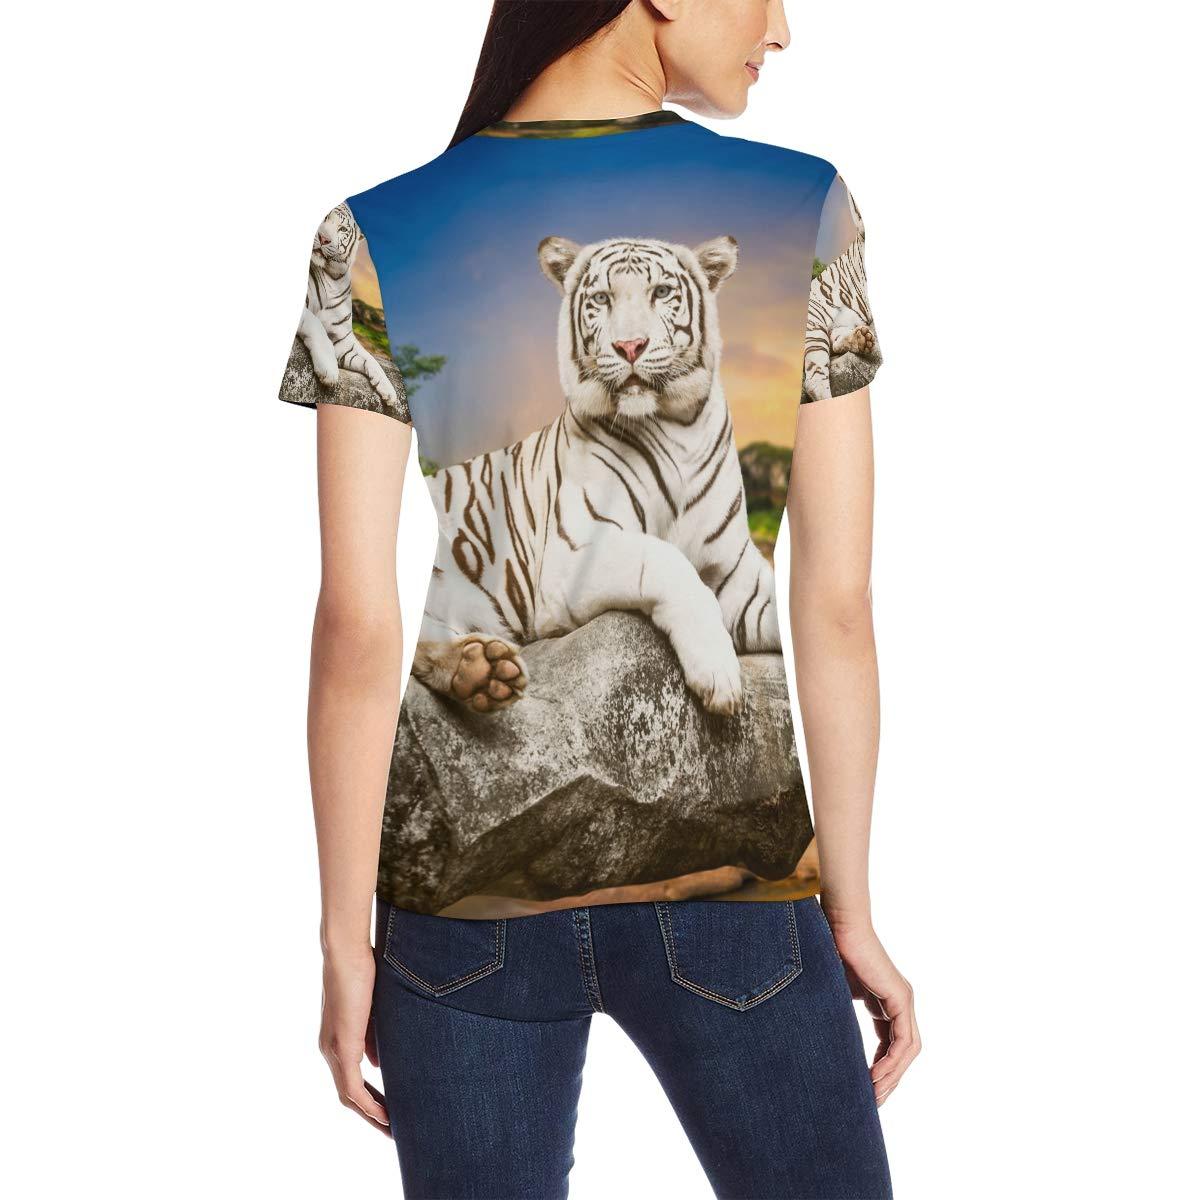 9336976b2 Tiger Pattern Print Women's Short Sleeve T-Shirt Top Tee at Amazon Women's  Clothing store: